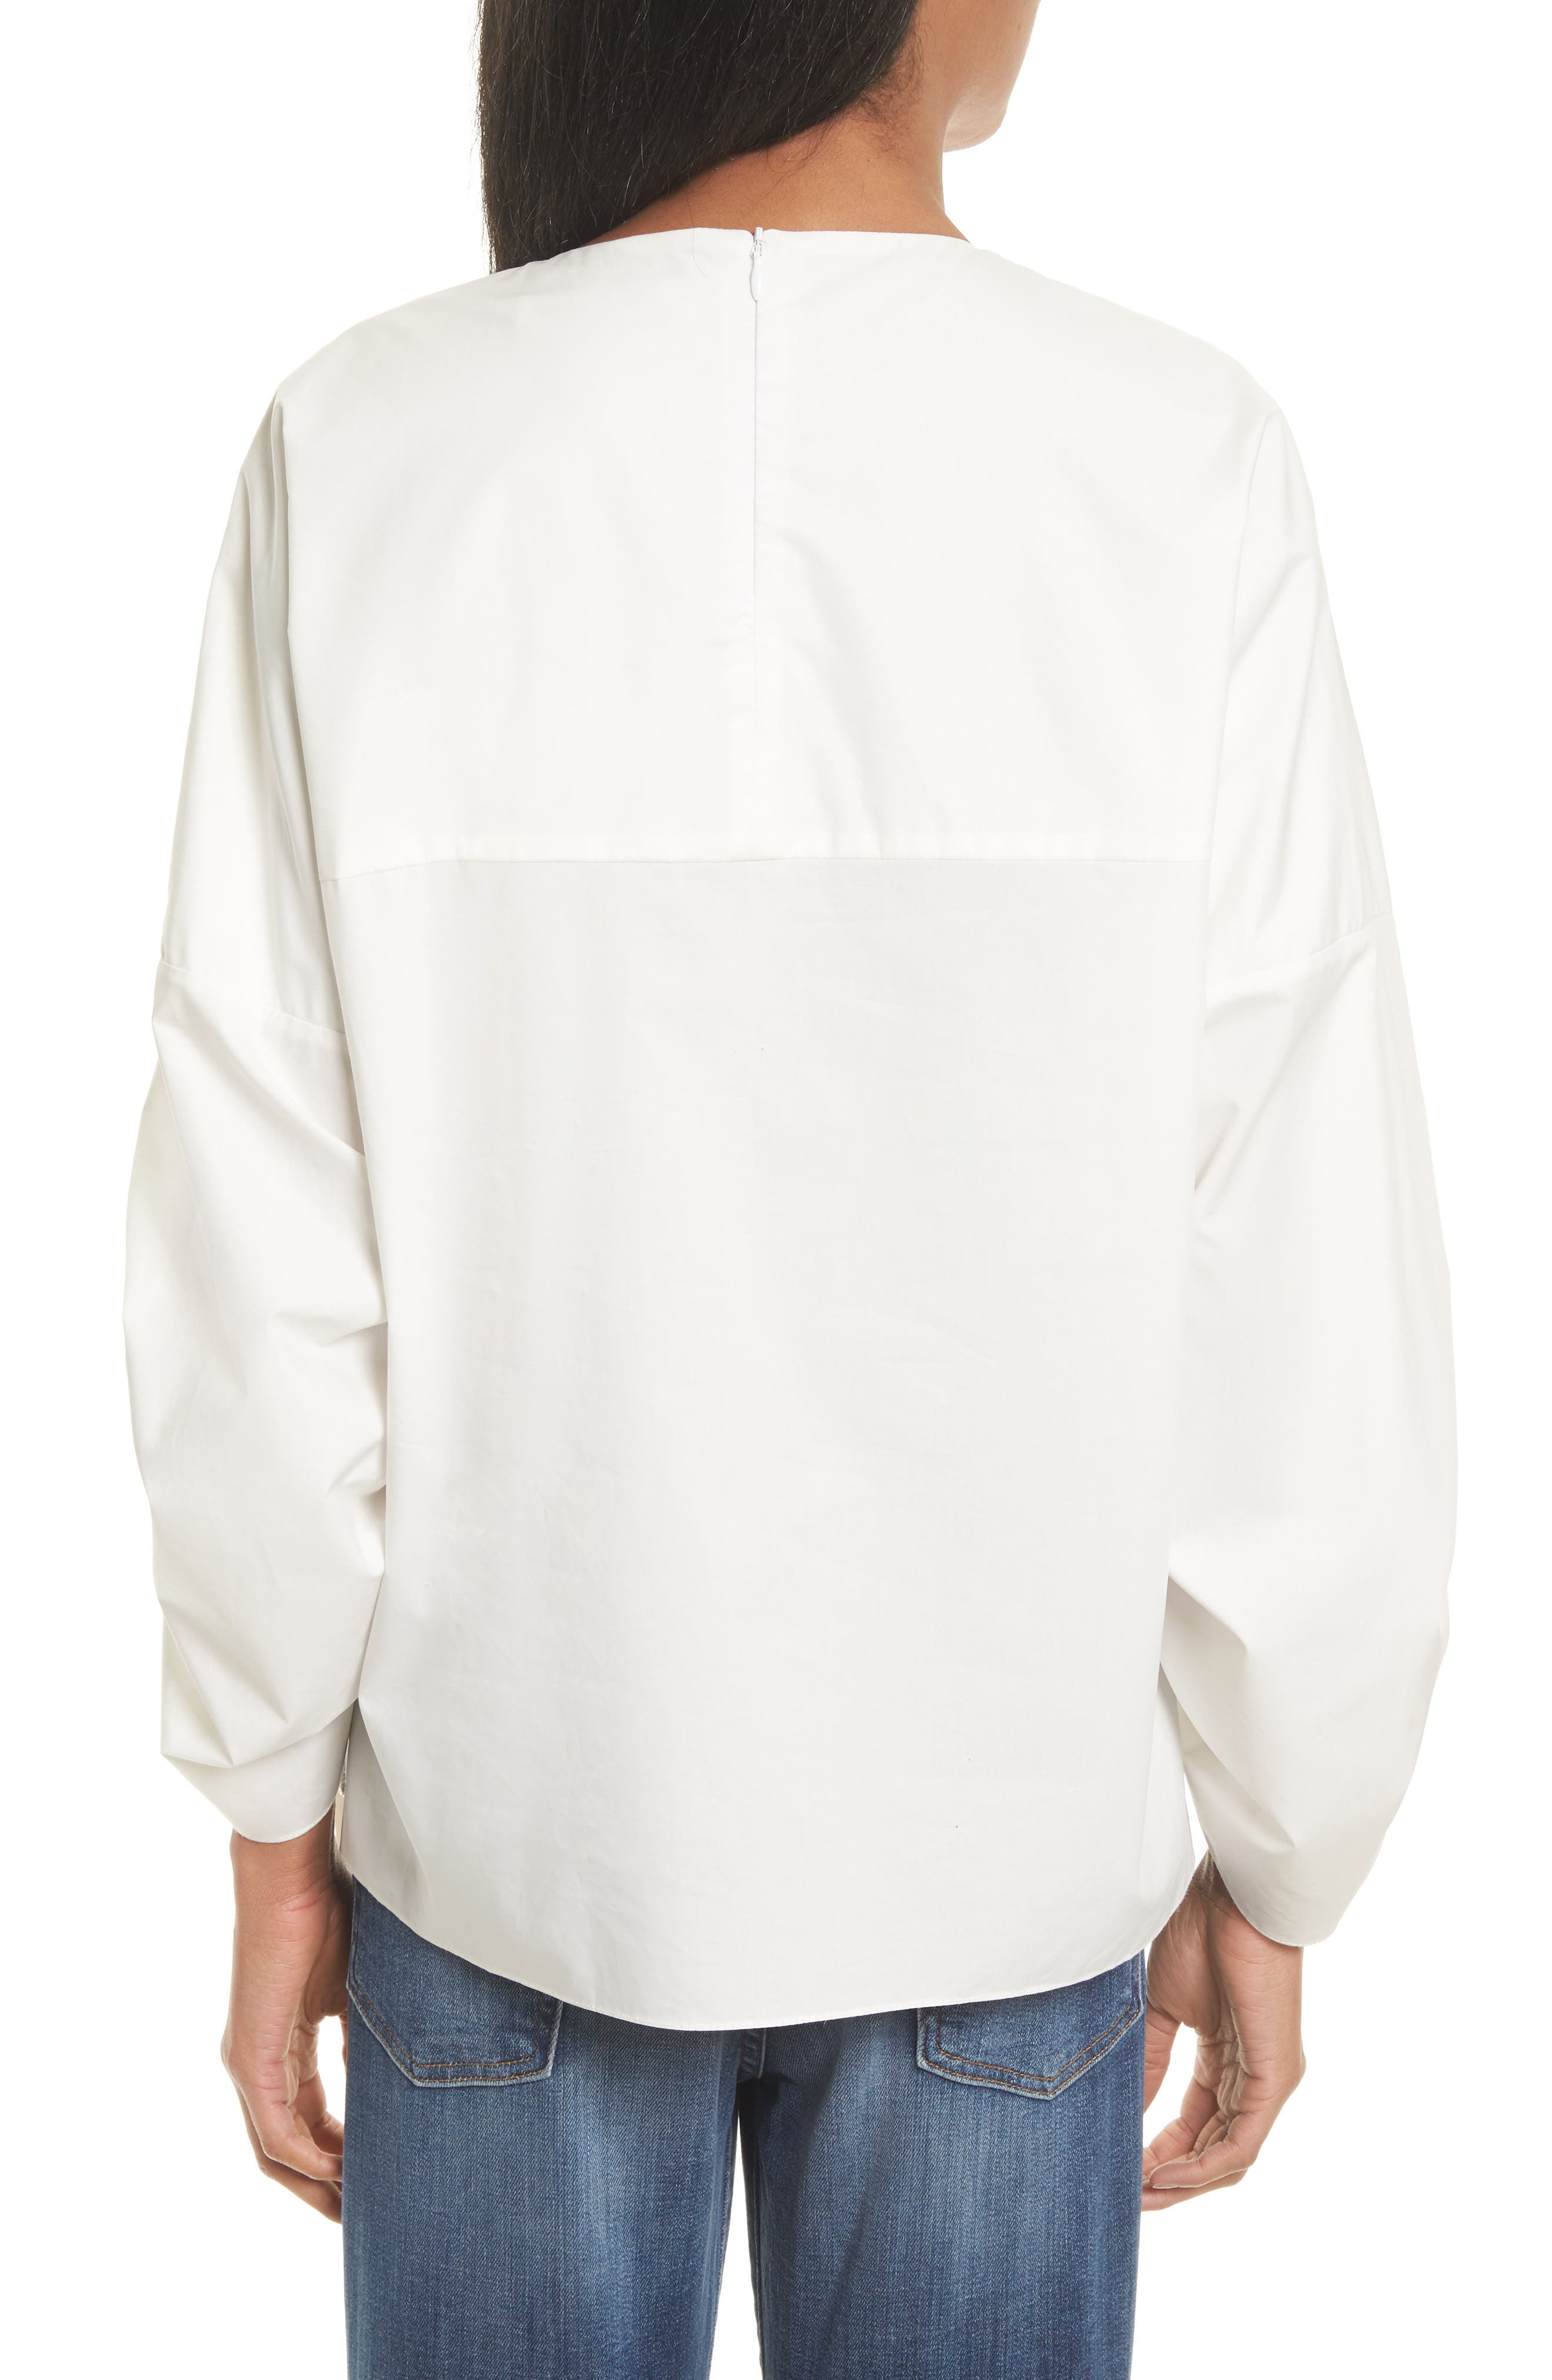 TIBI,                             Bell Sleeve Cotton Poplin Top,                             Alternate thumbnail 2, color,                             104